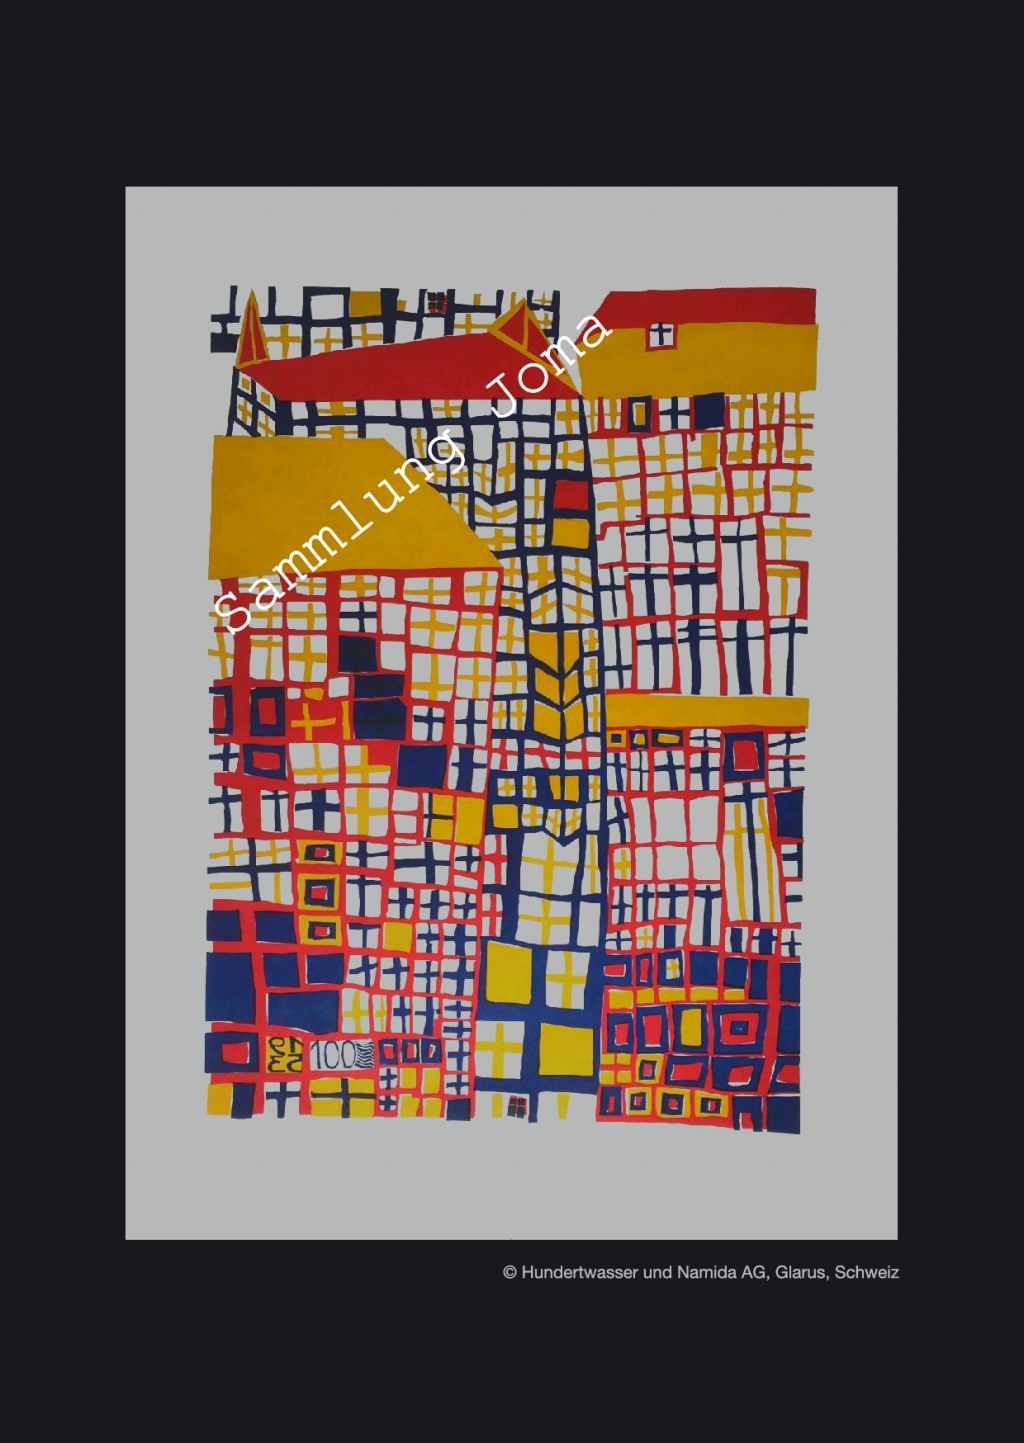 "Hundertwasser Hauptwerk DREI HOHE H""USER 1953 WERK 155 HWG 12 Rene"